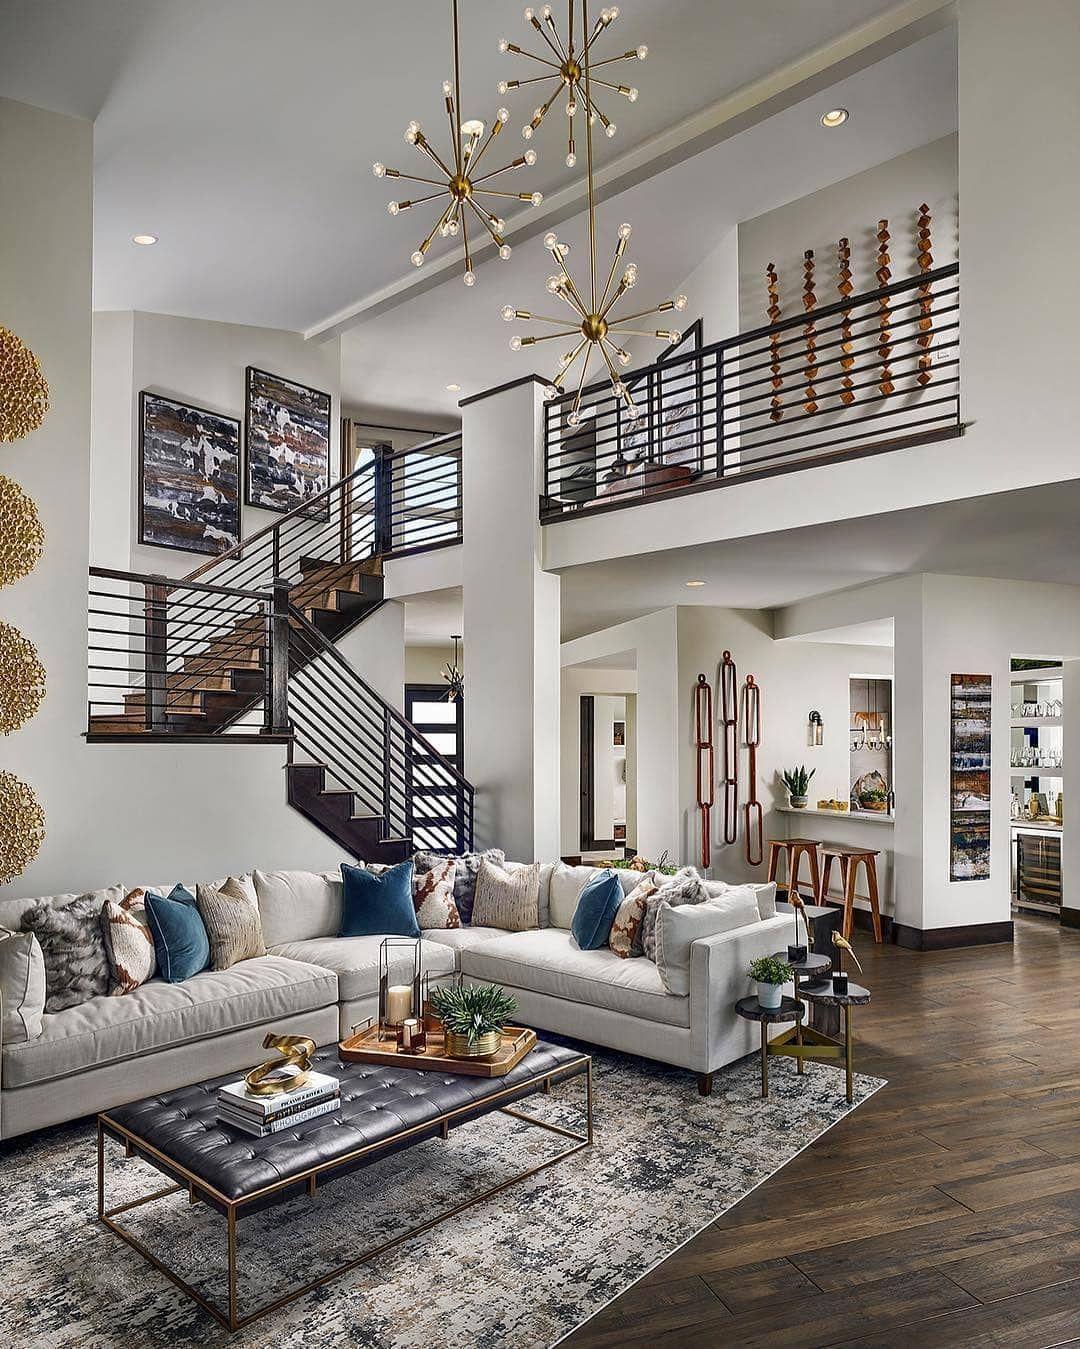 Luxury House Designs On Instagram Beautiful Designed Interior